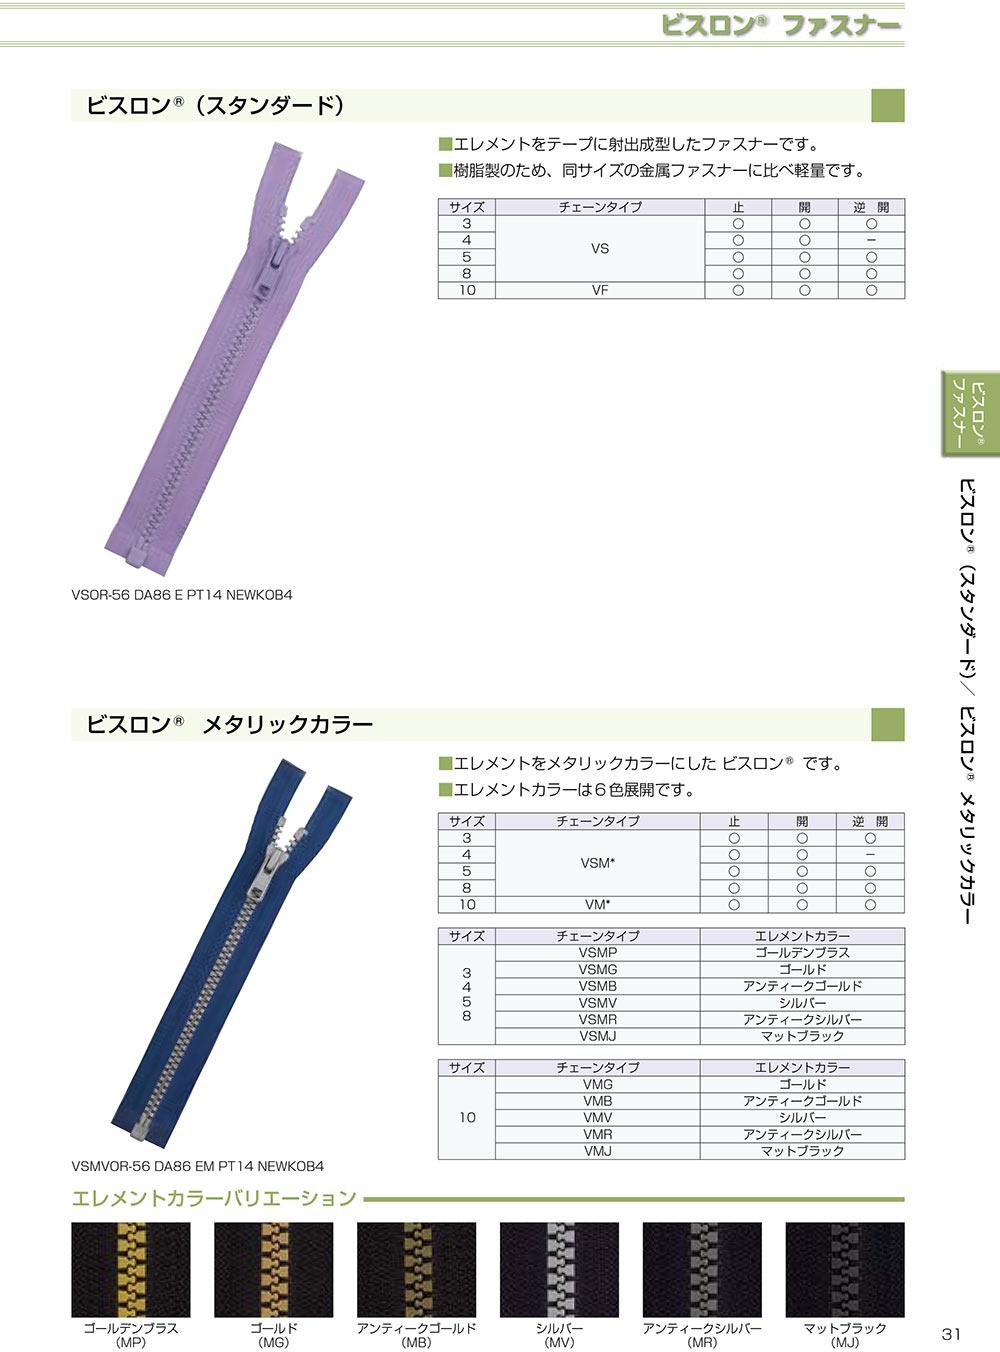 3VSC YKKビスロンファスナー 3サイズ 止め YKK/オークラ商事 - ApparelX アパレル資材卸通販